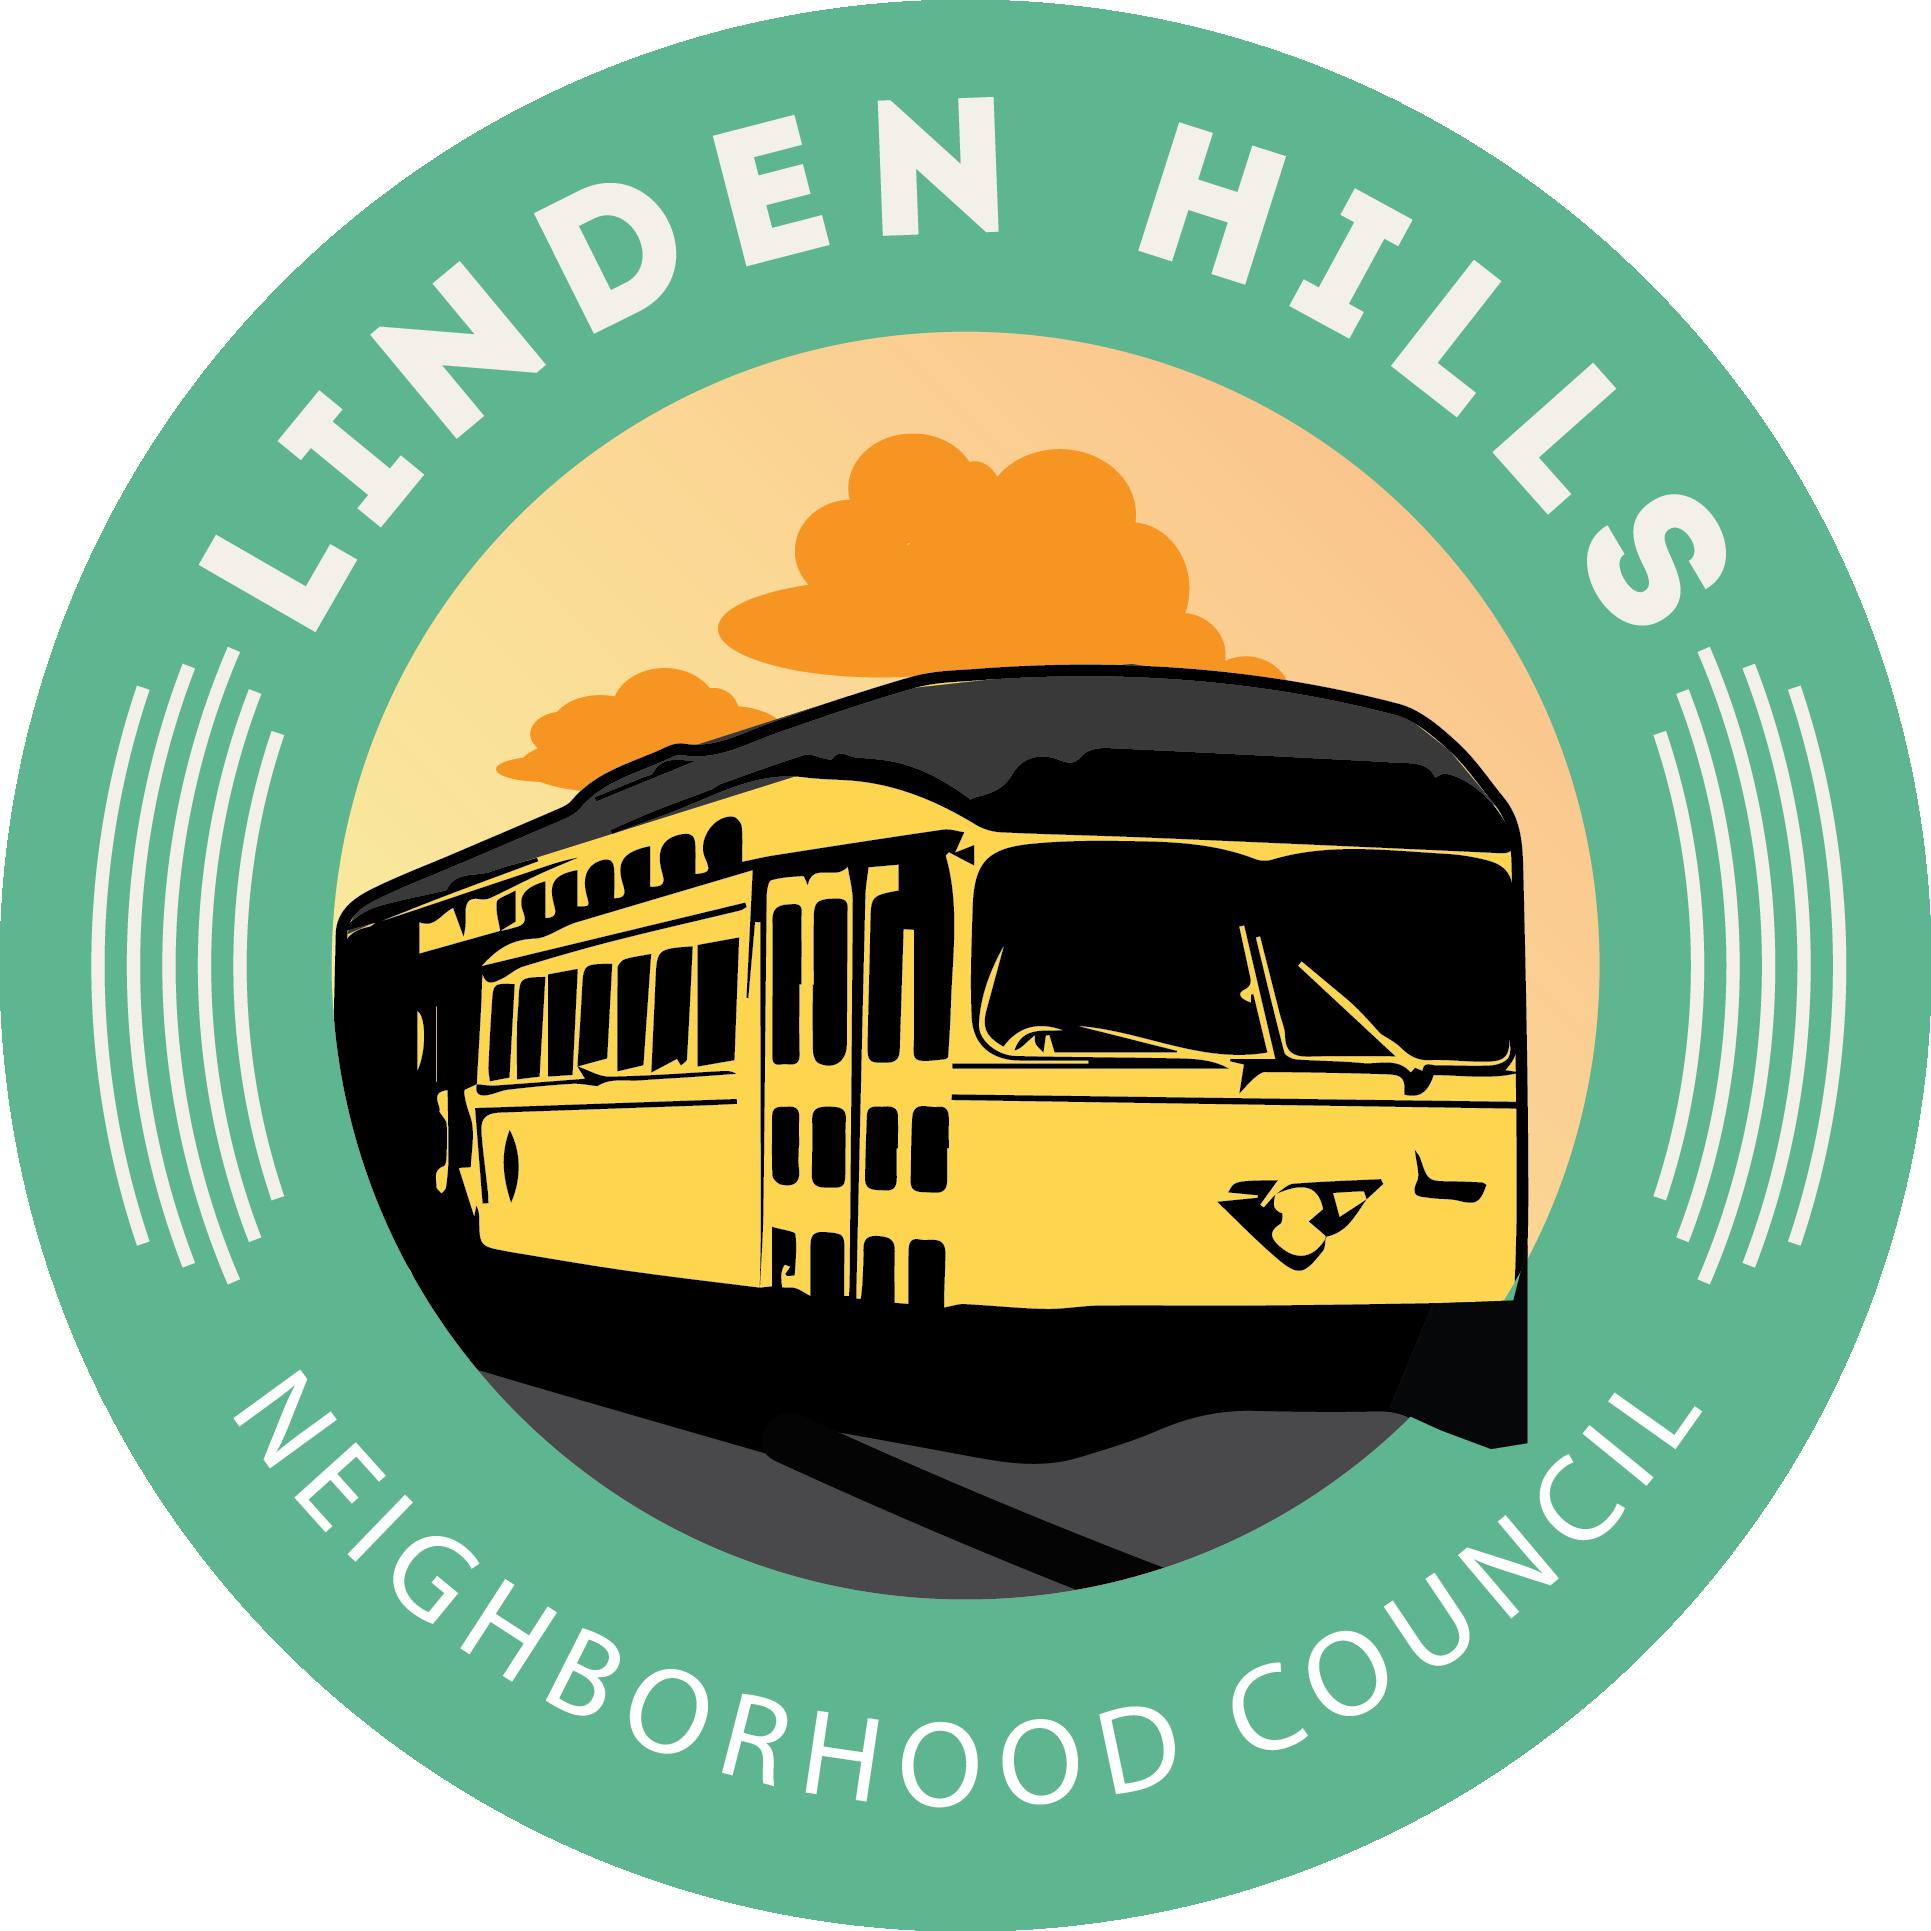 Linden Hills Neighborhood Council